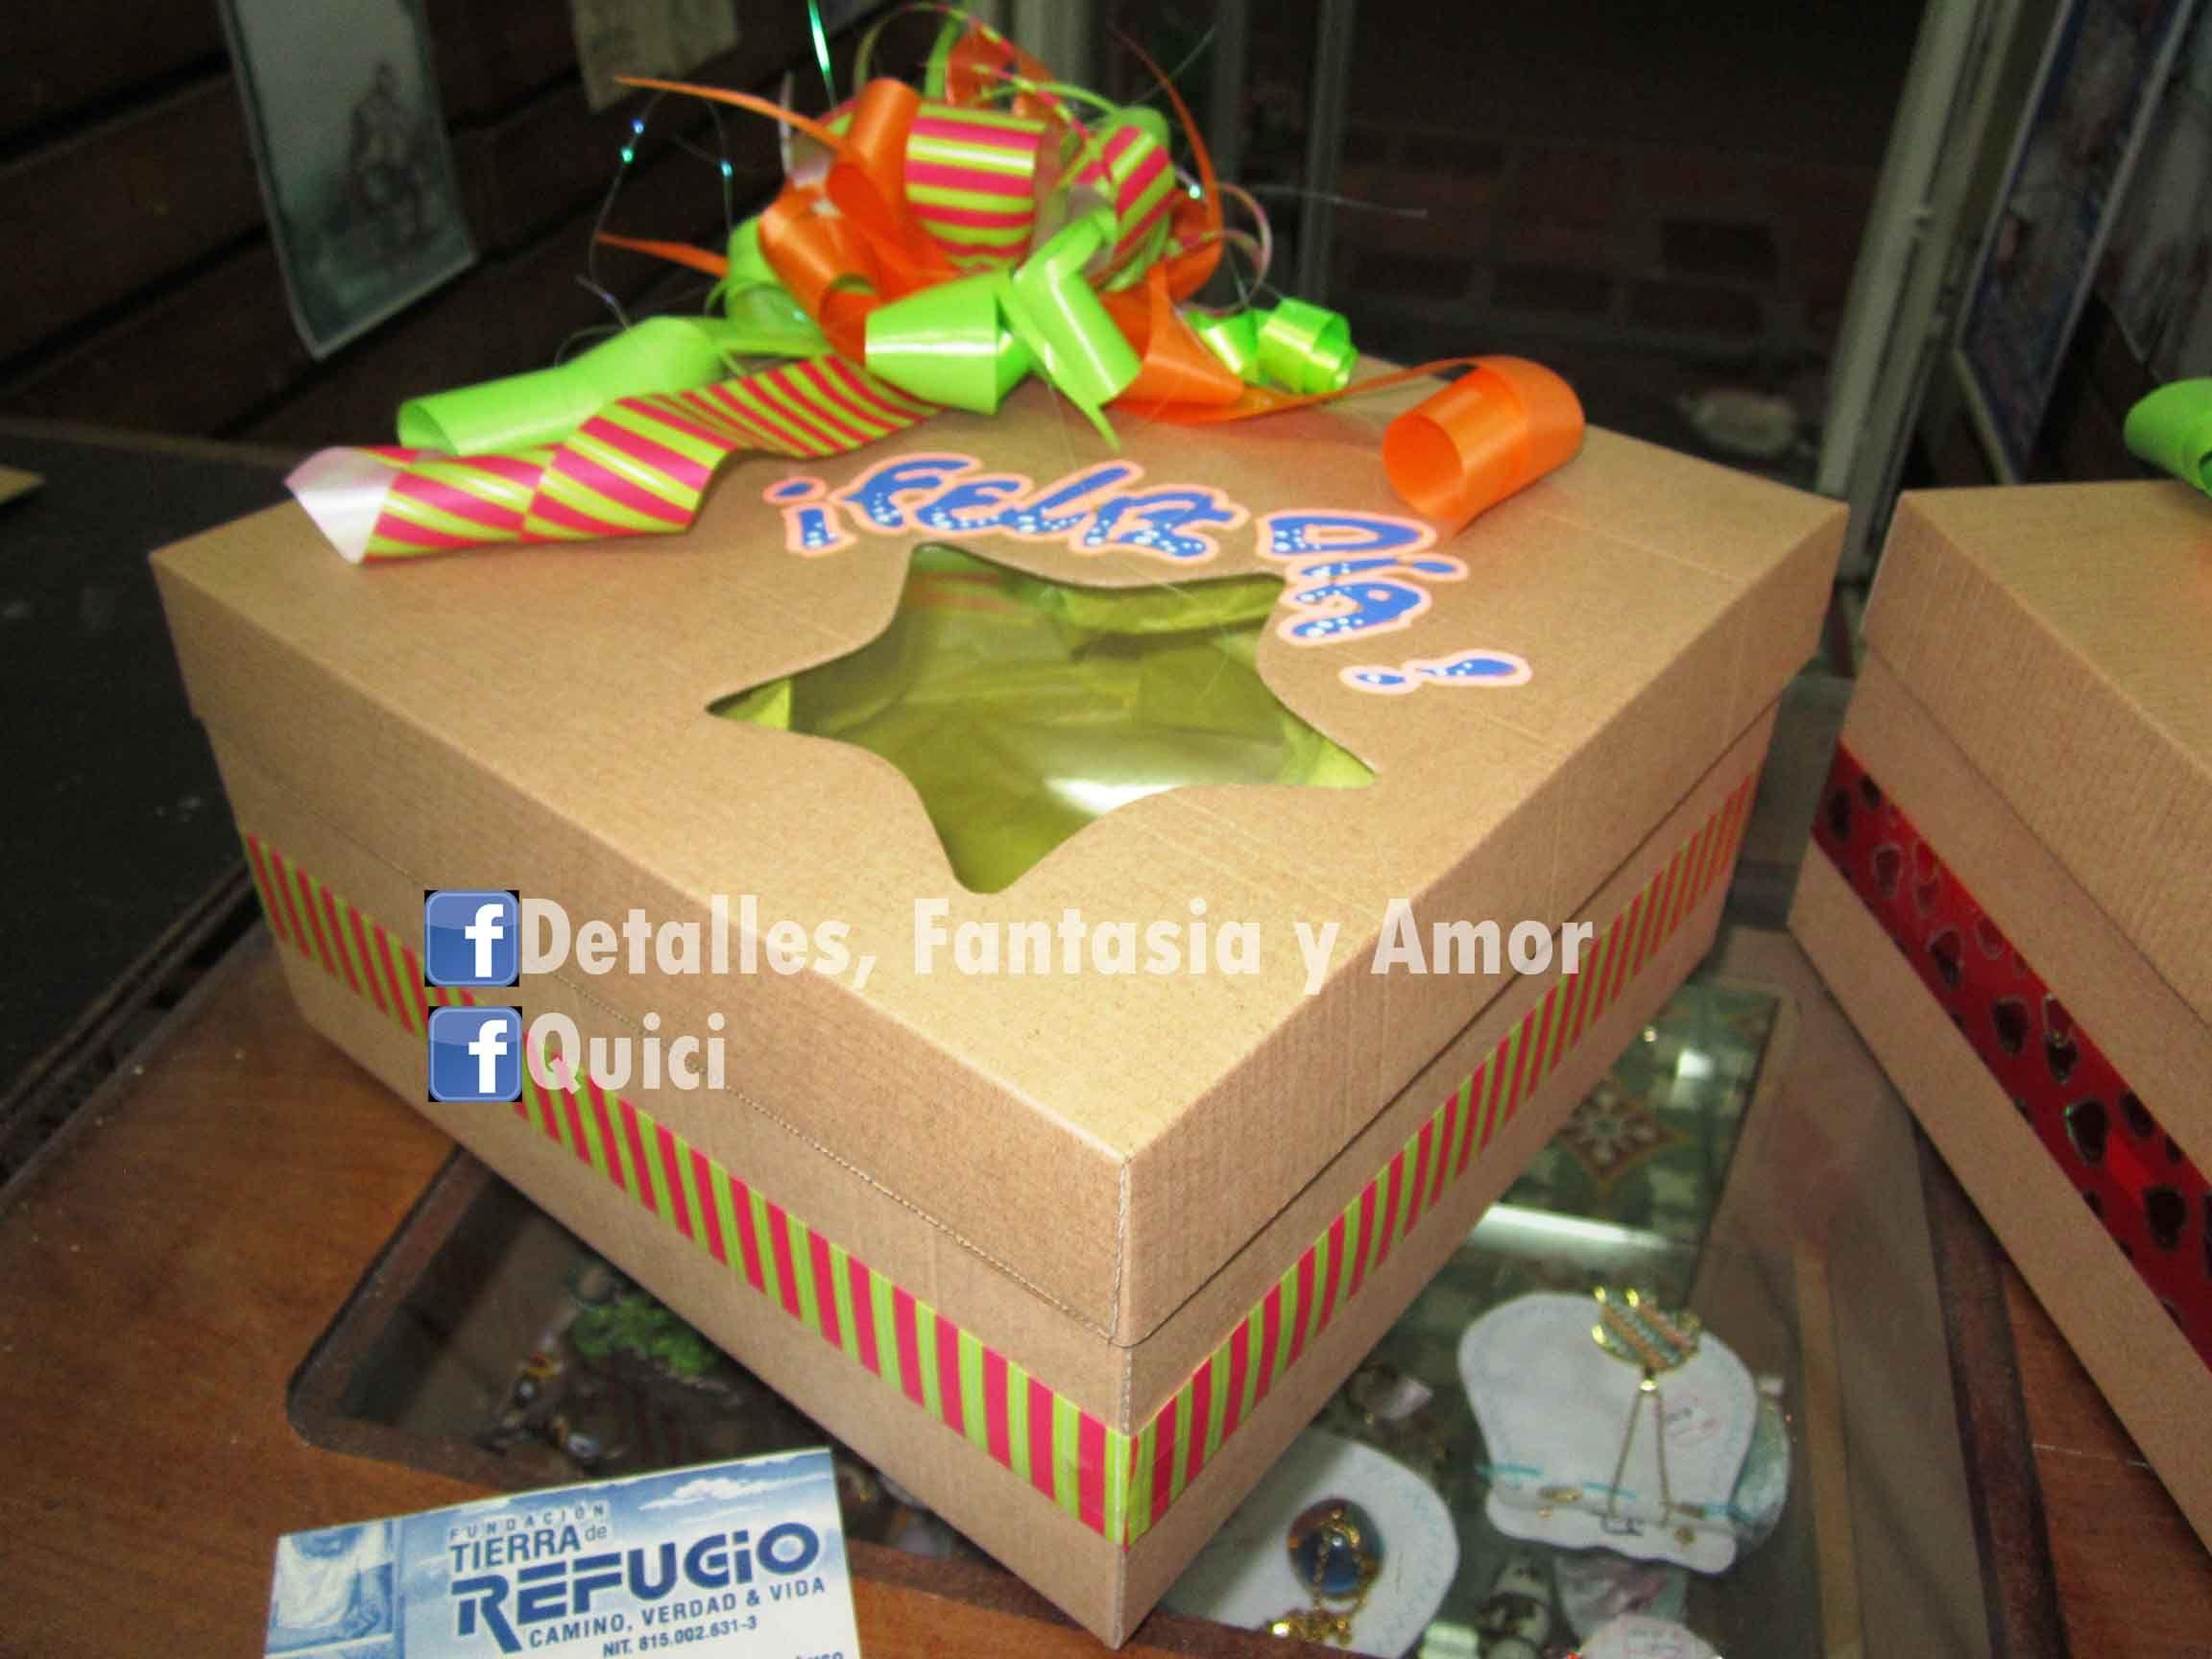 Caja decorada para regalo con ventana de acetato proyectos de cajas decoradas pinterest - Manualidades cajas decoradas ...